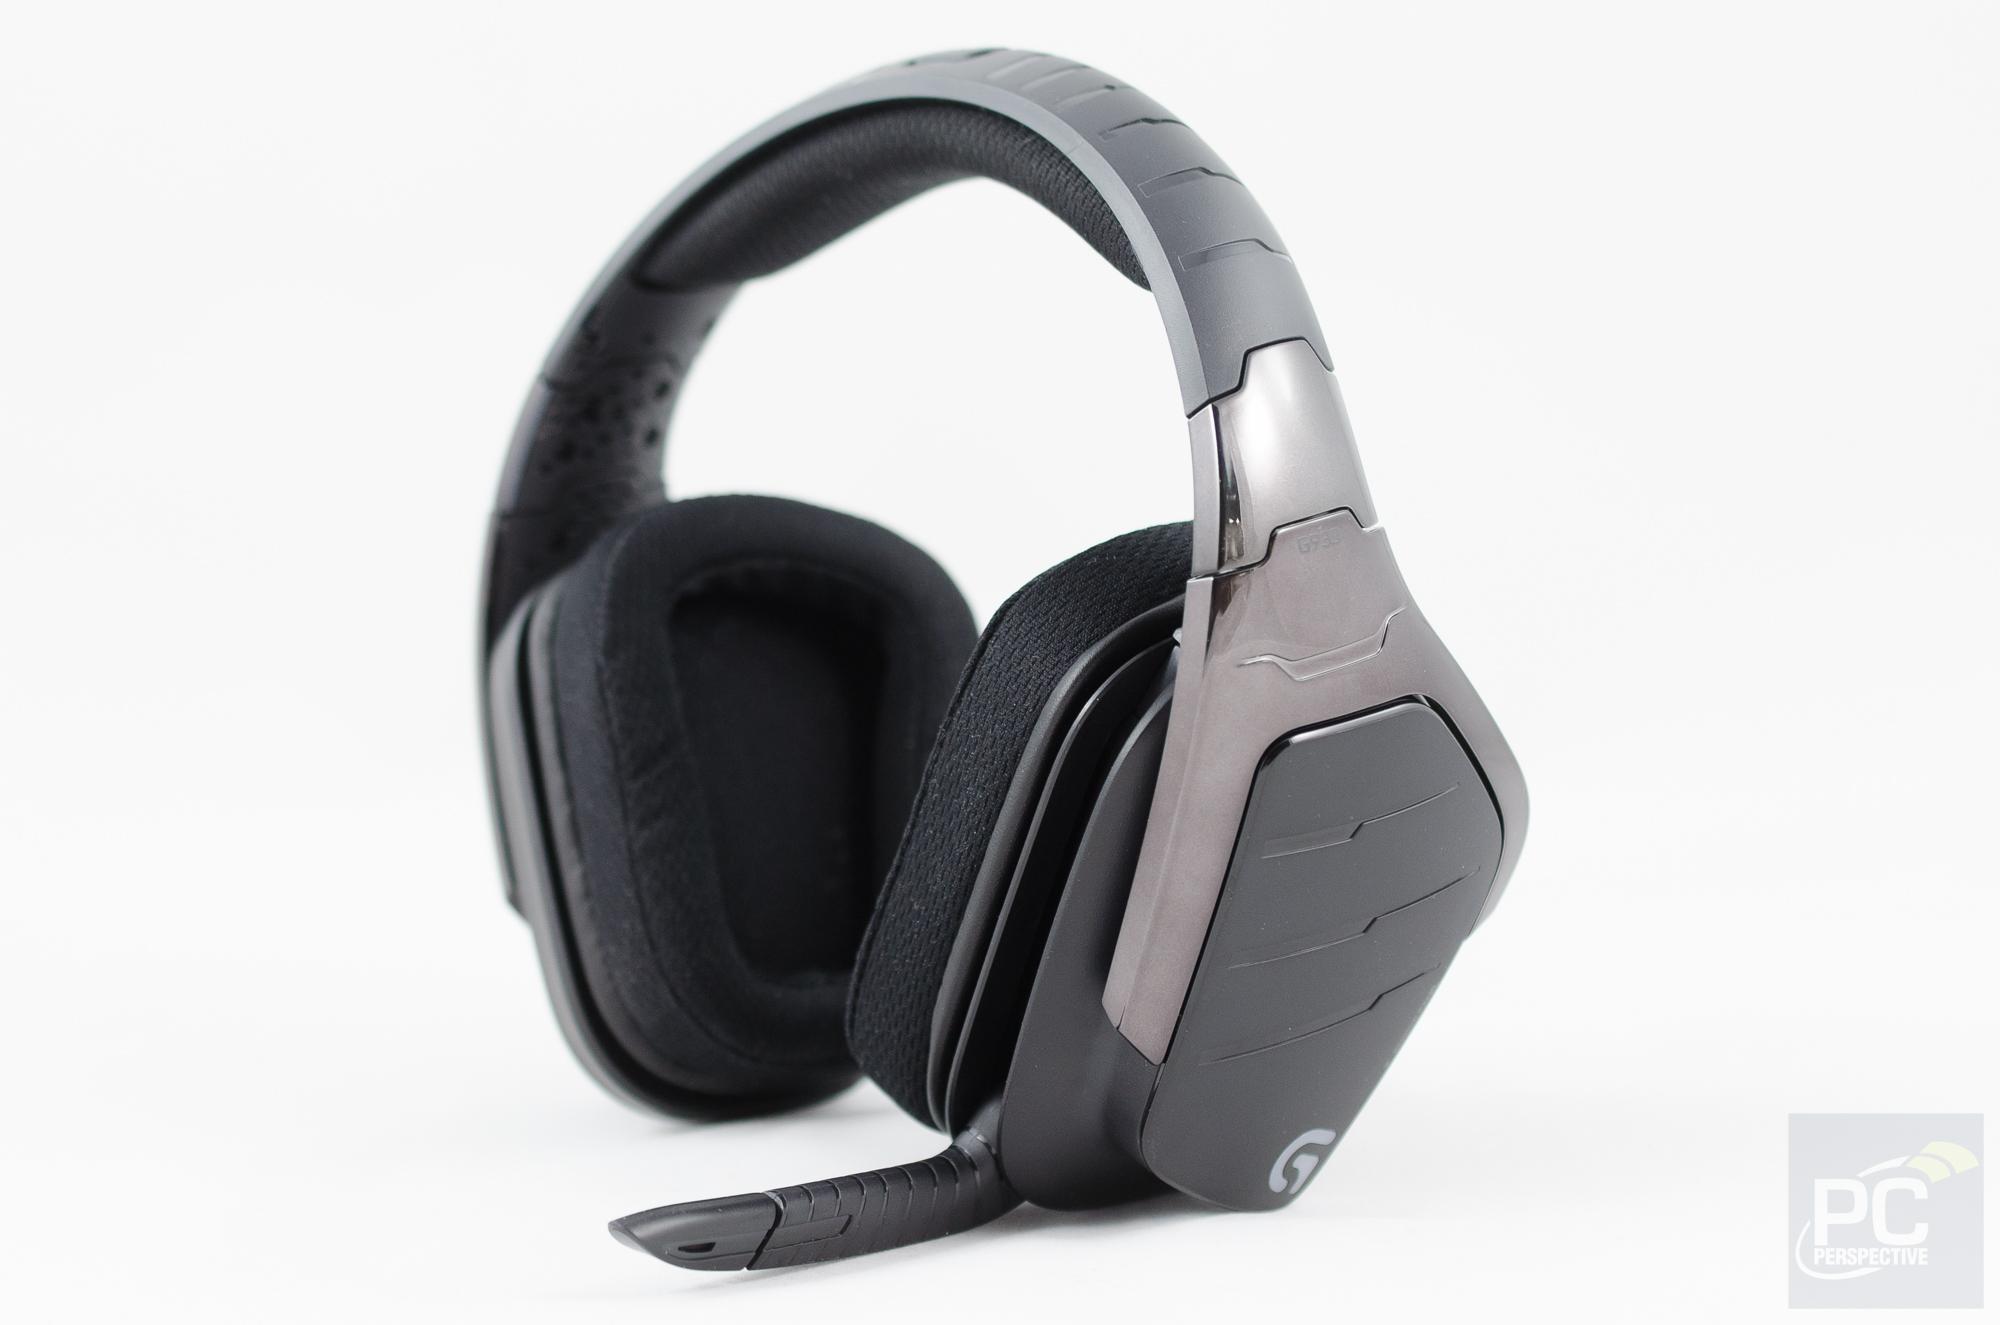 Logitech Artemis Spectrum G933/G633 Headset Review - PC Perspective